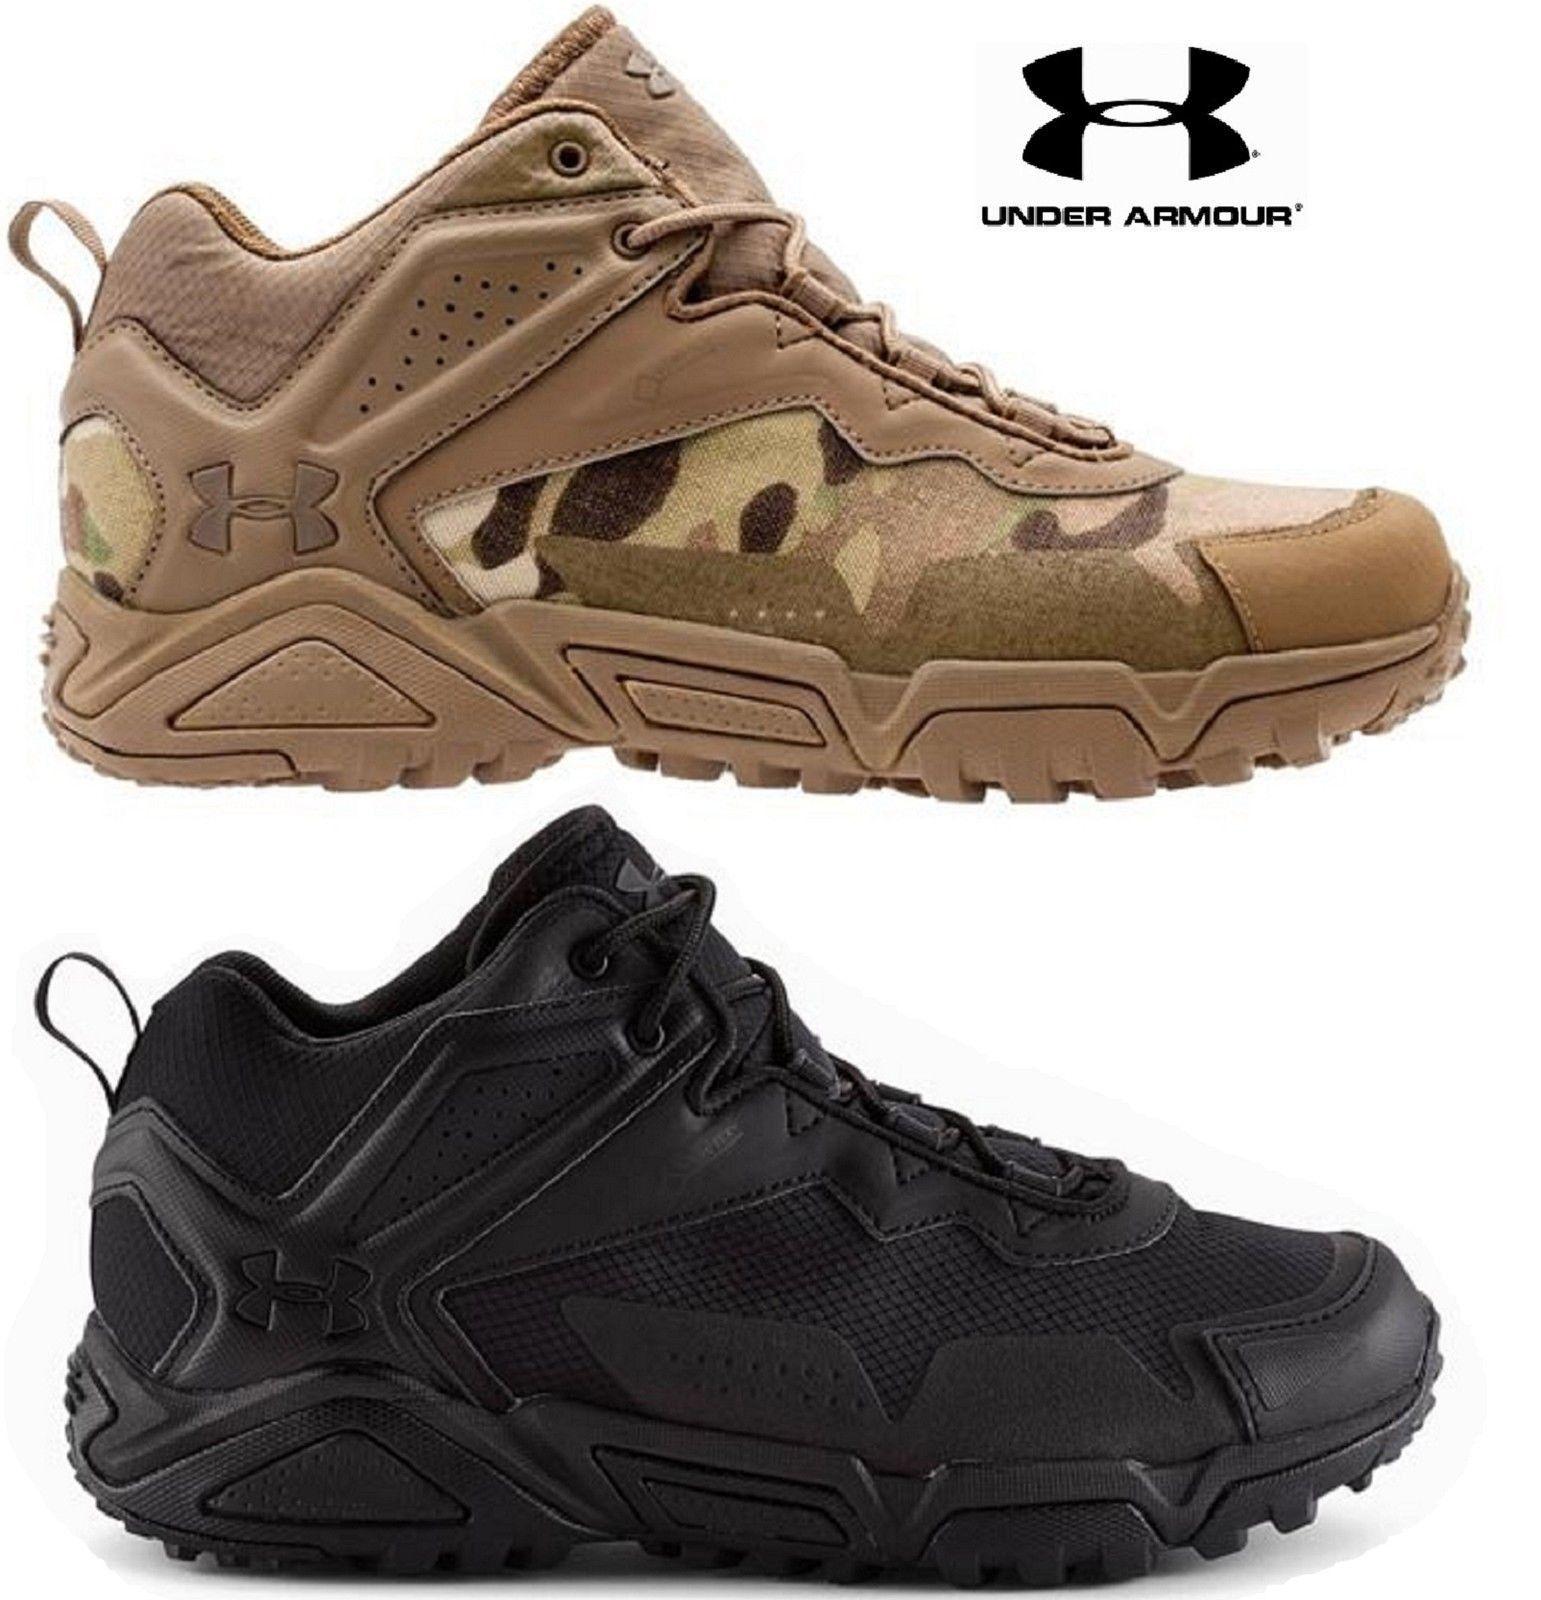 zapatos tacticos under armour mexico online university